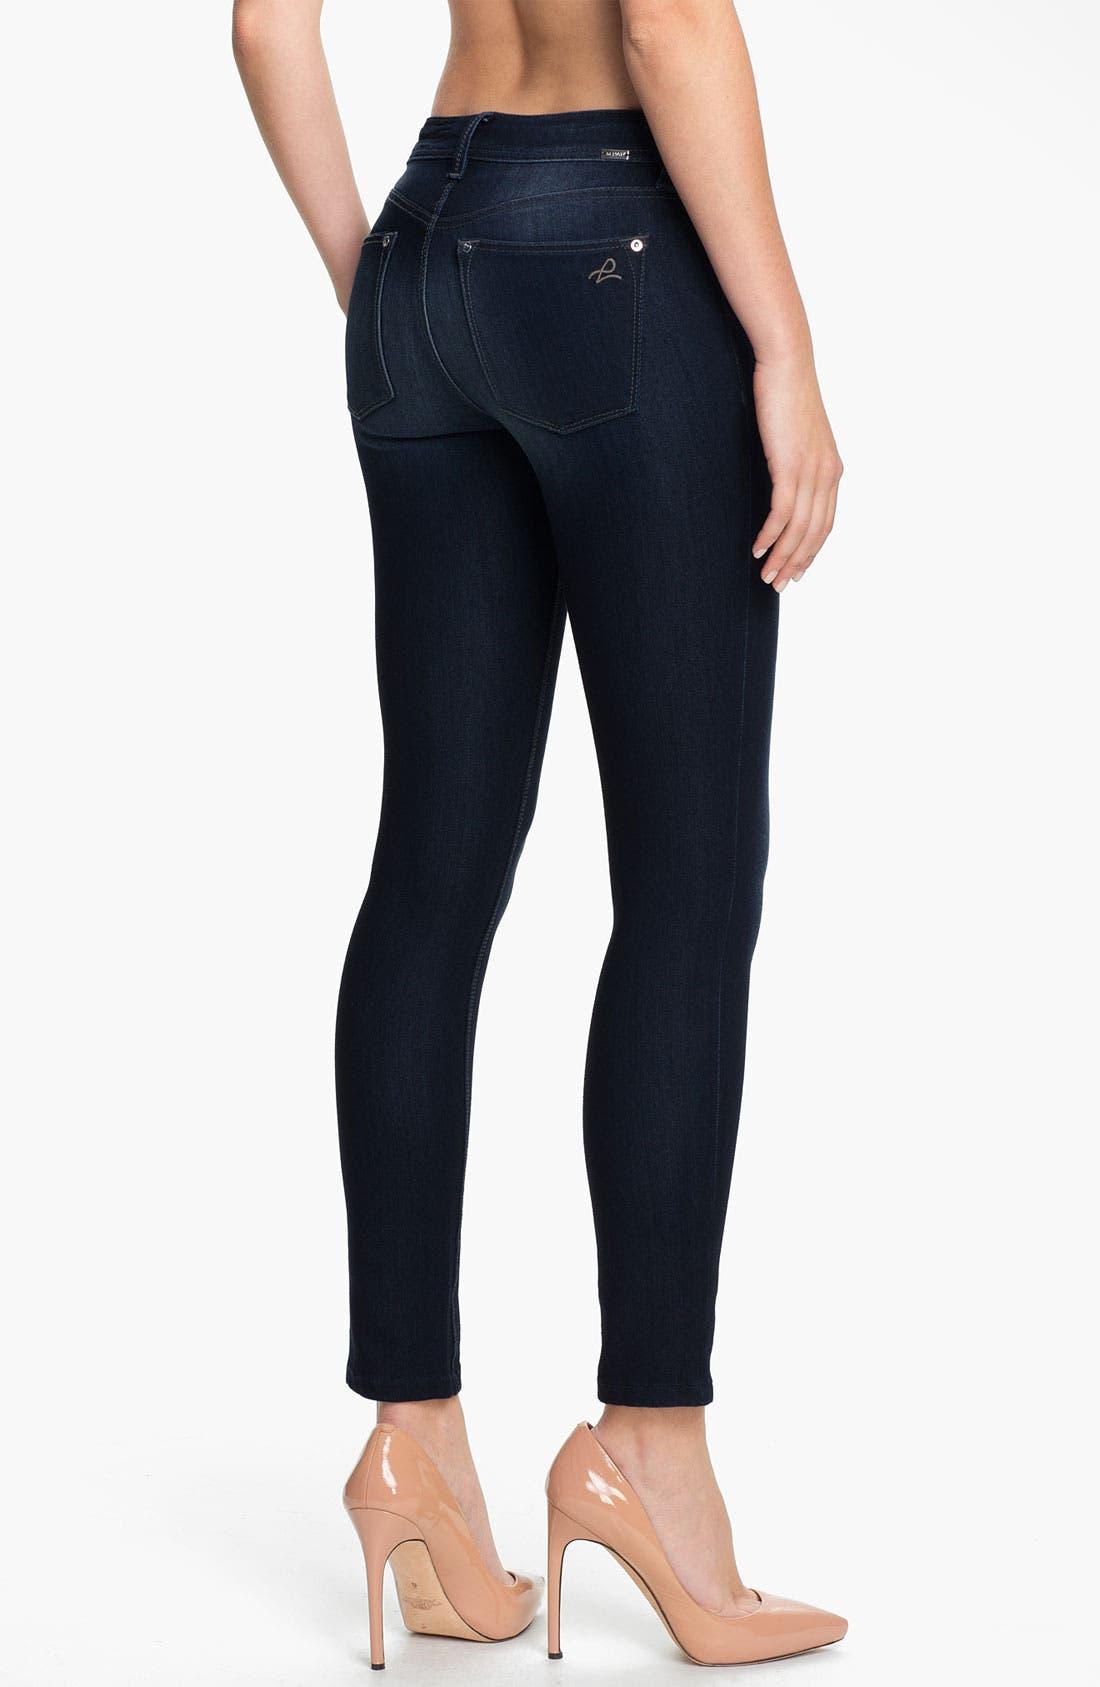 Alternate Image 2  - DL1961 'Emma' Power Legging Jeans (Bloom)